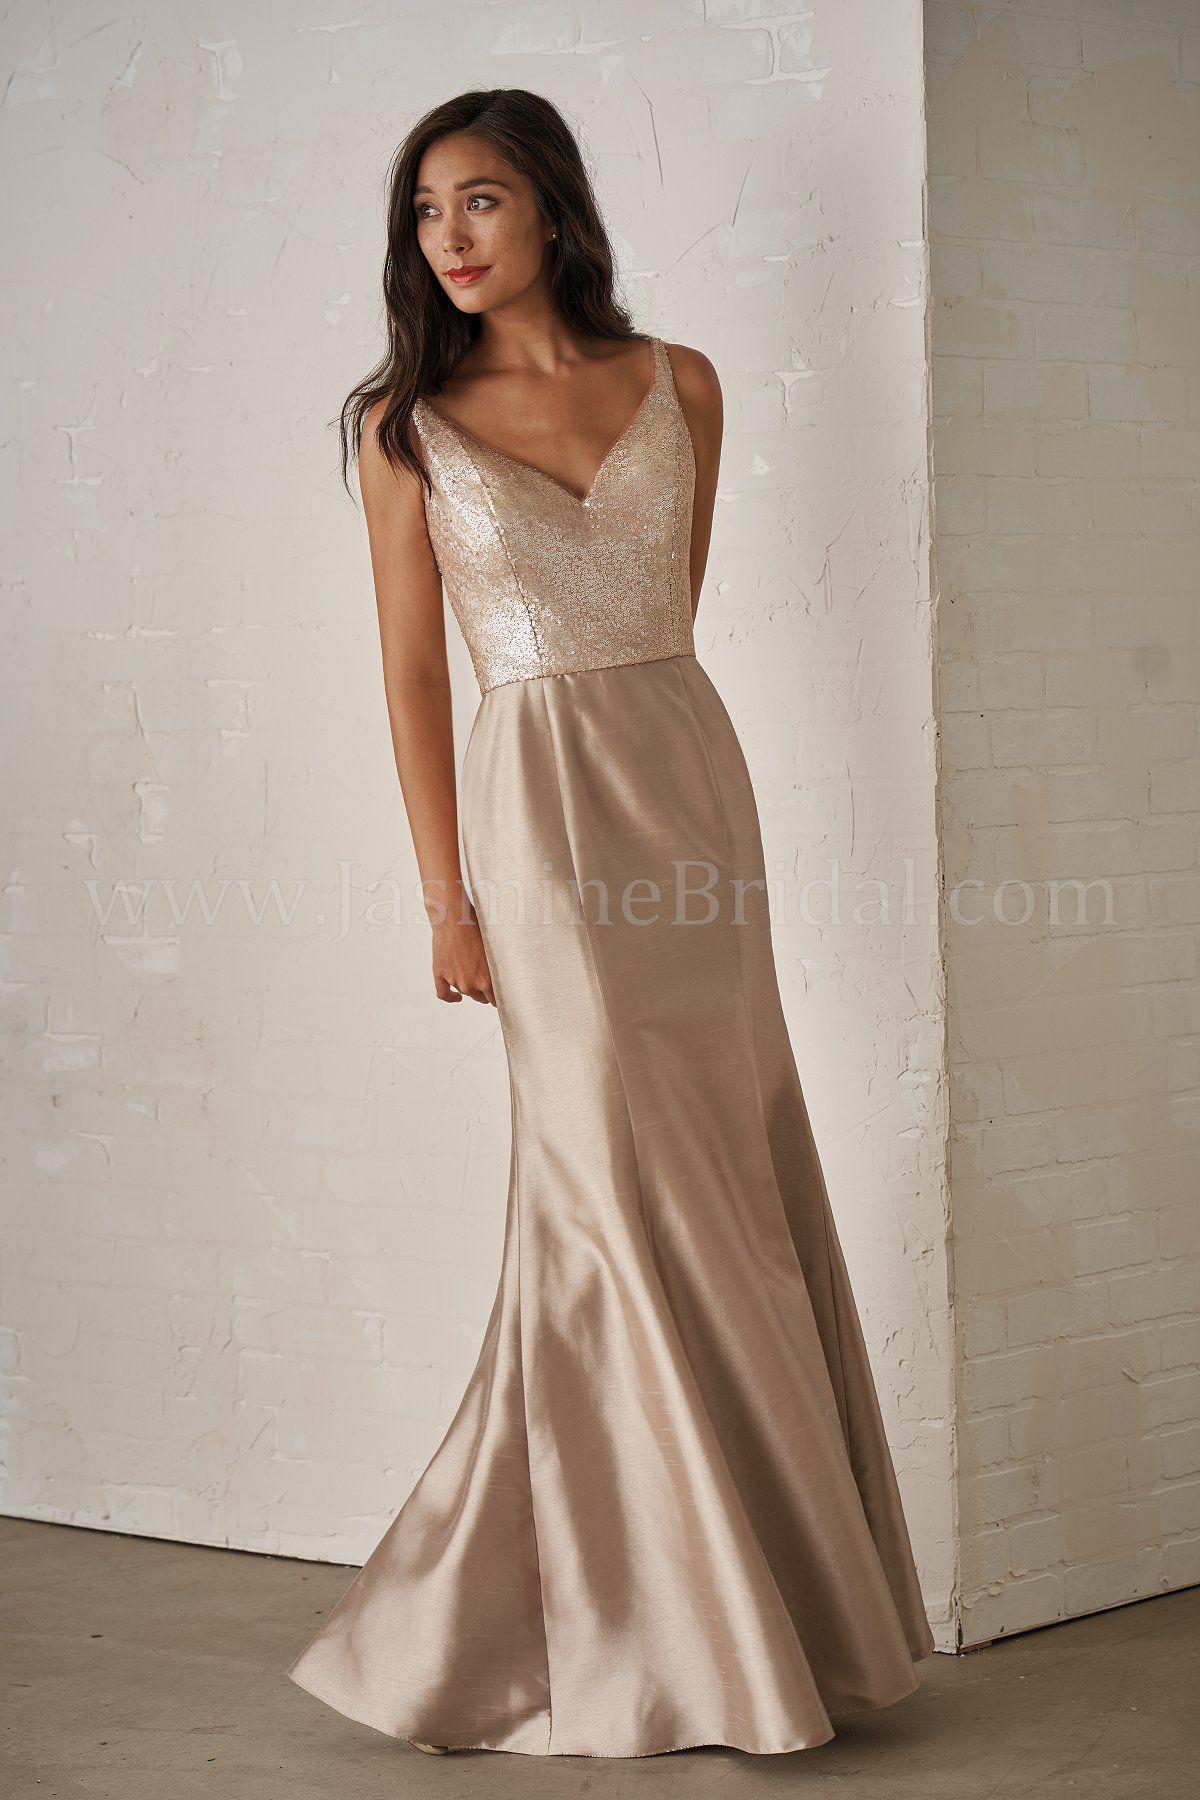 Jasmine bridal jasmine bridesmaids style p in light gold